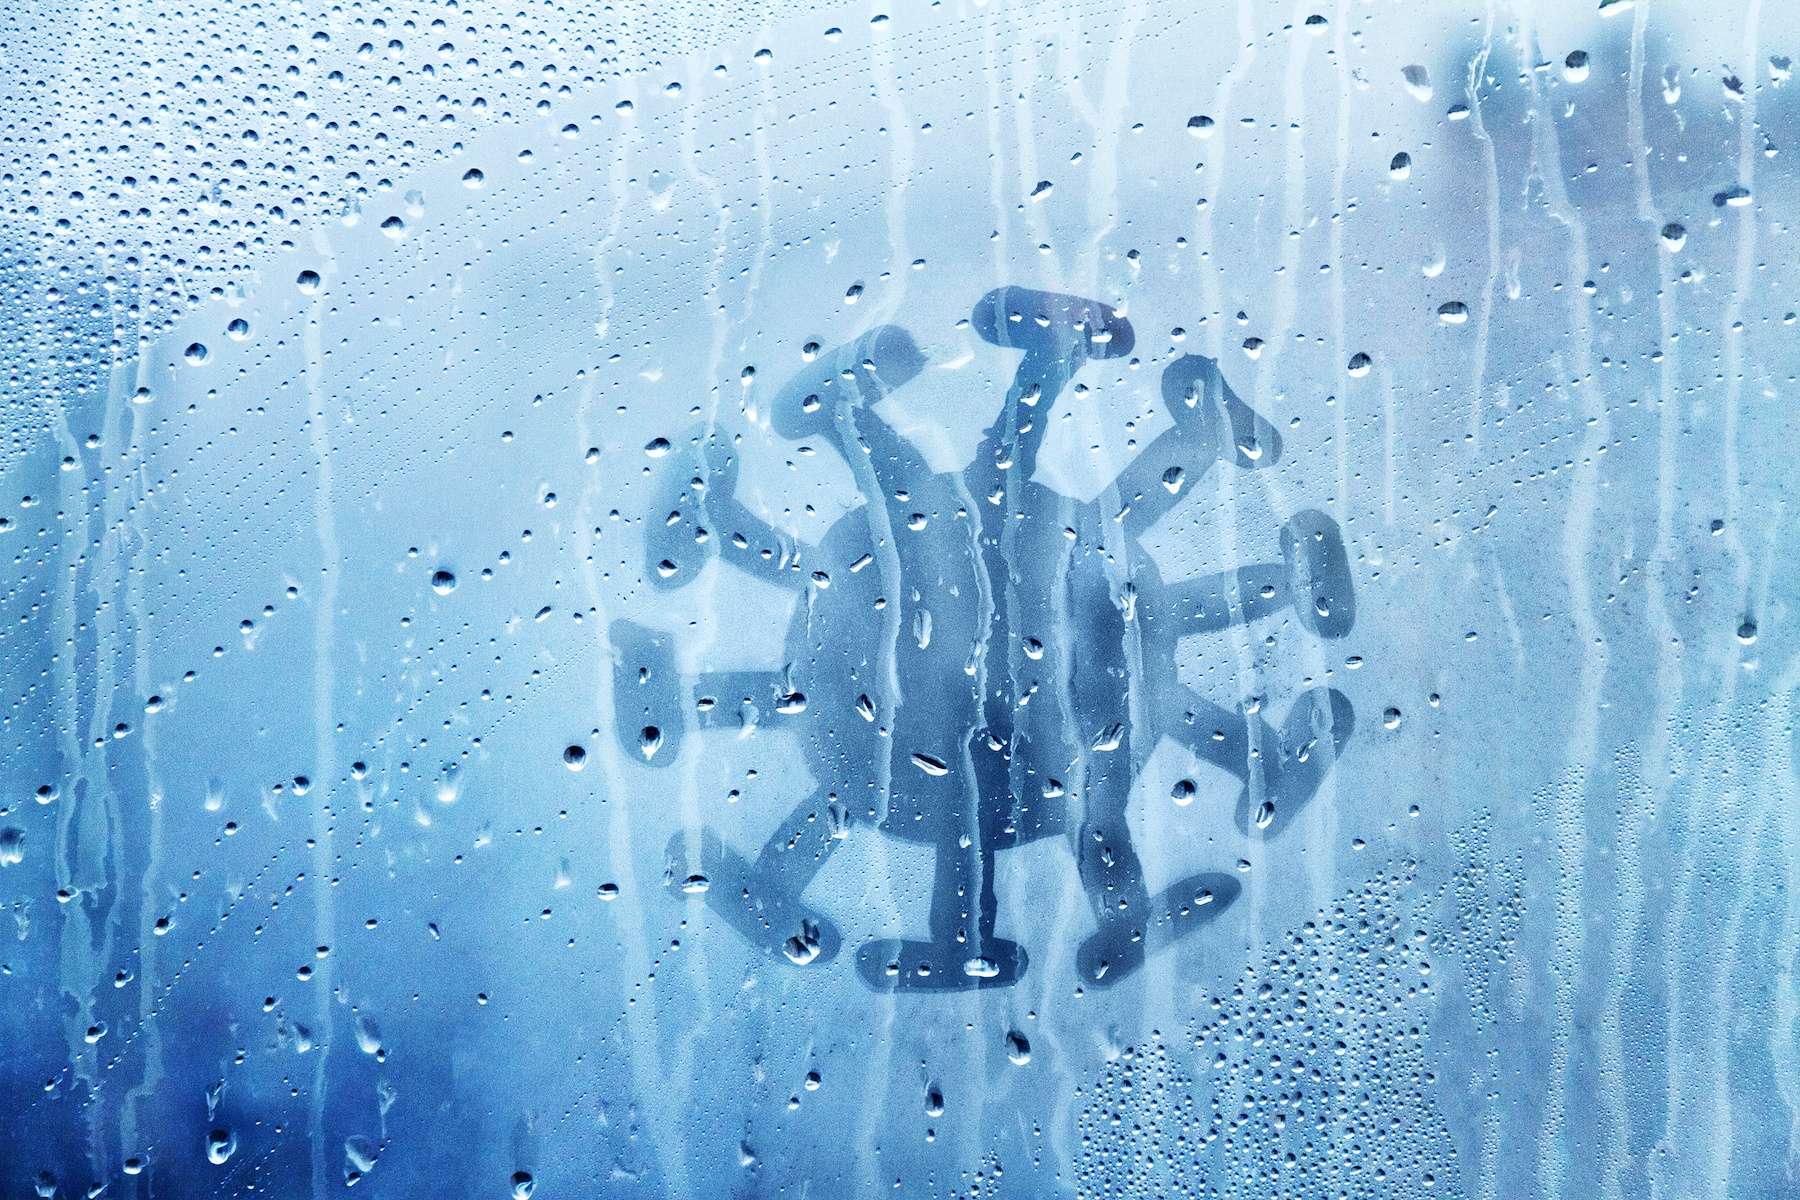 Le coronavirus apprécie le temps froid et humide. © ksenija1803z, Adobe Stock